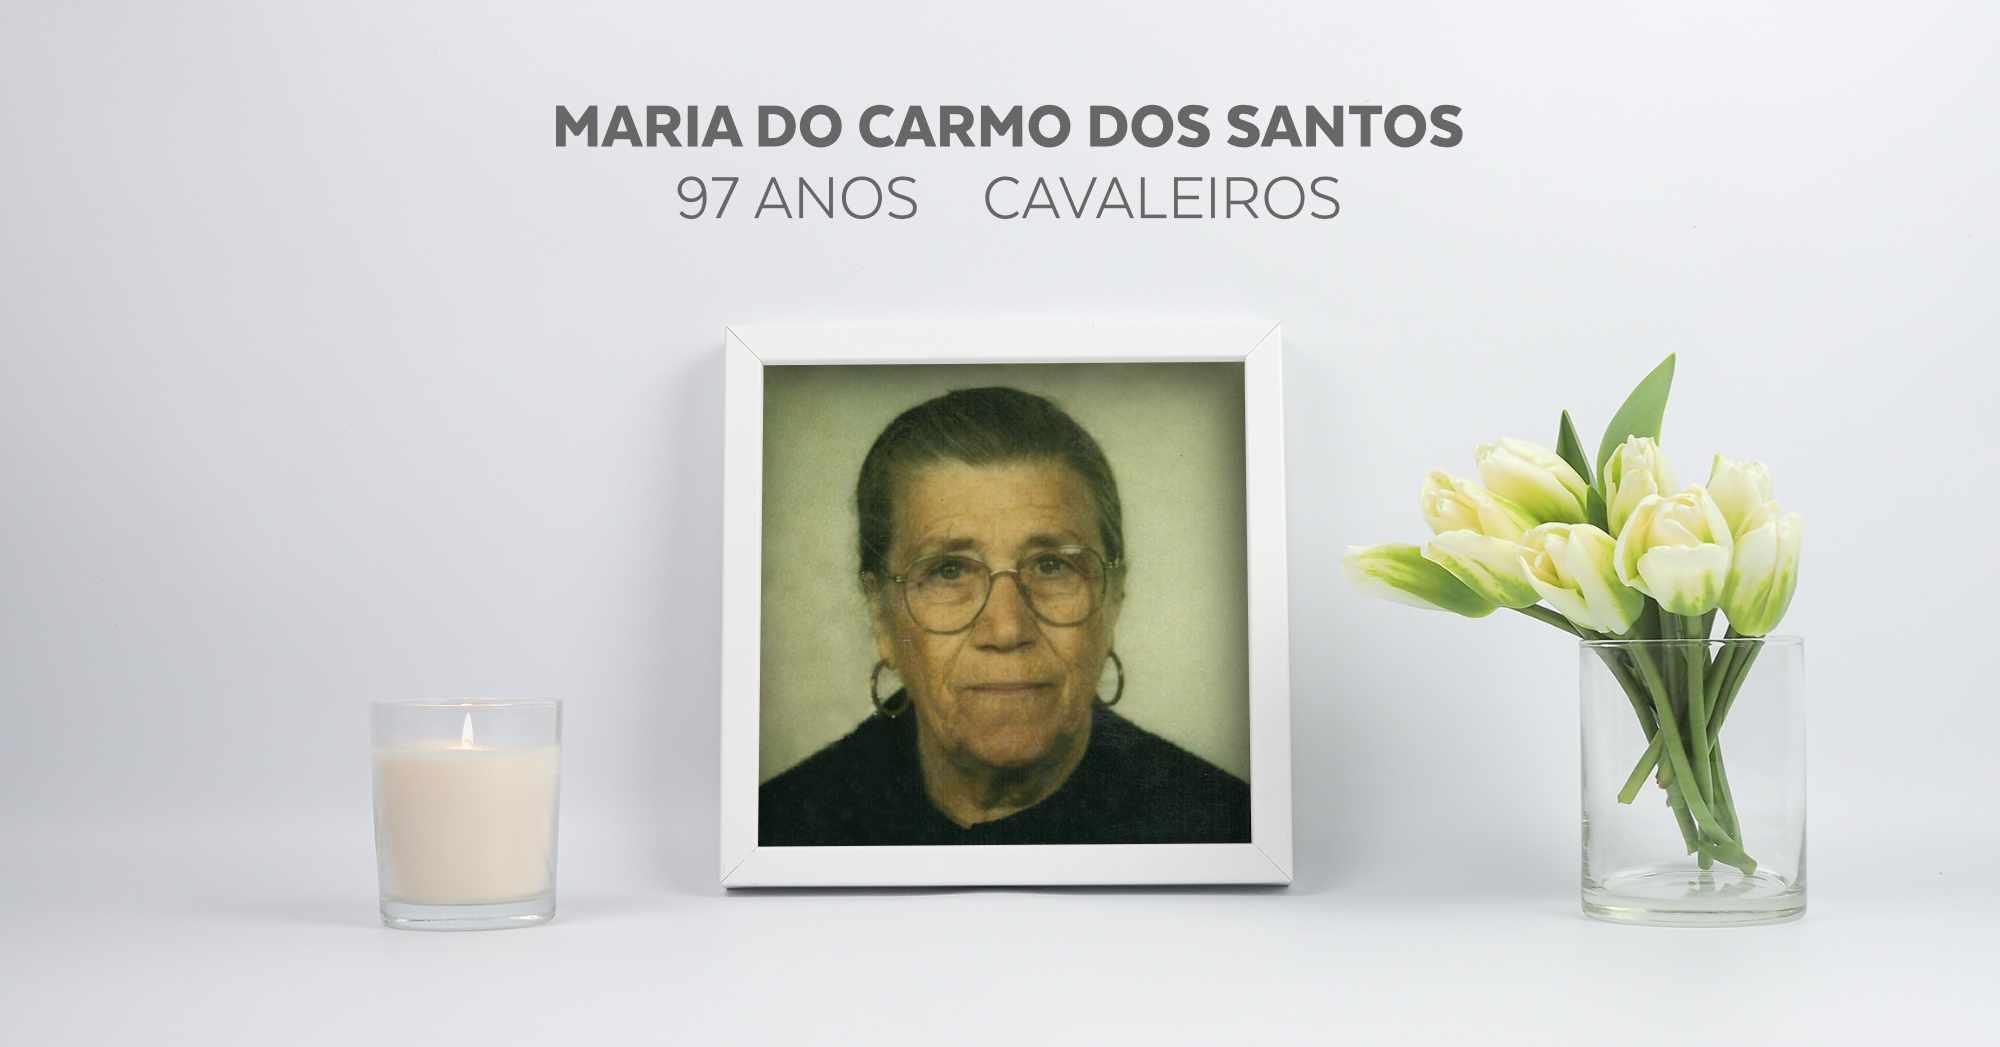 Maria do Carmo dos Santos